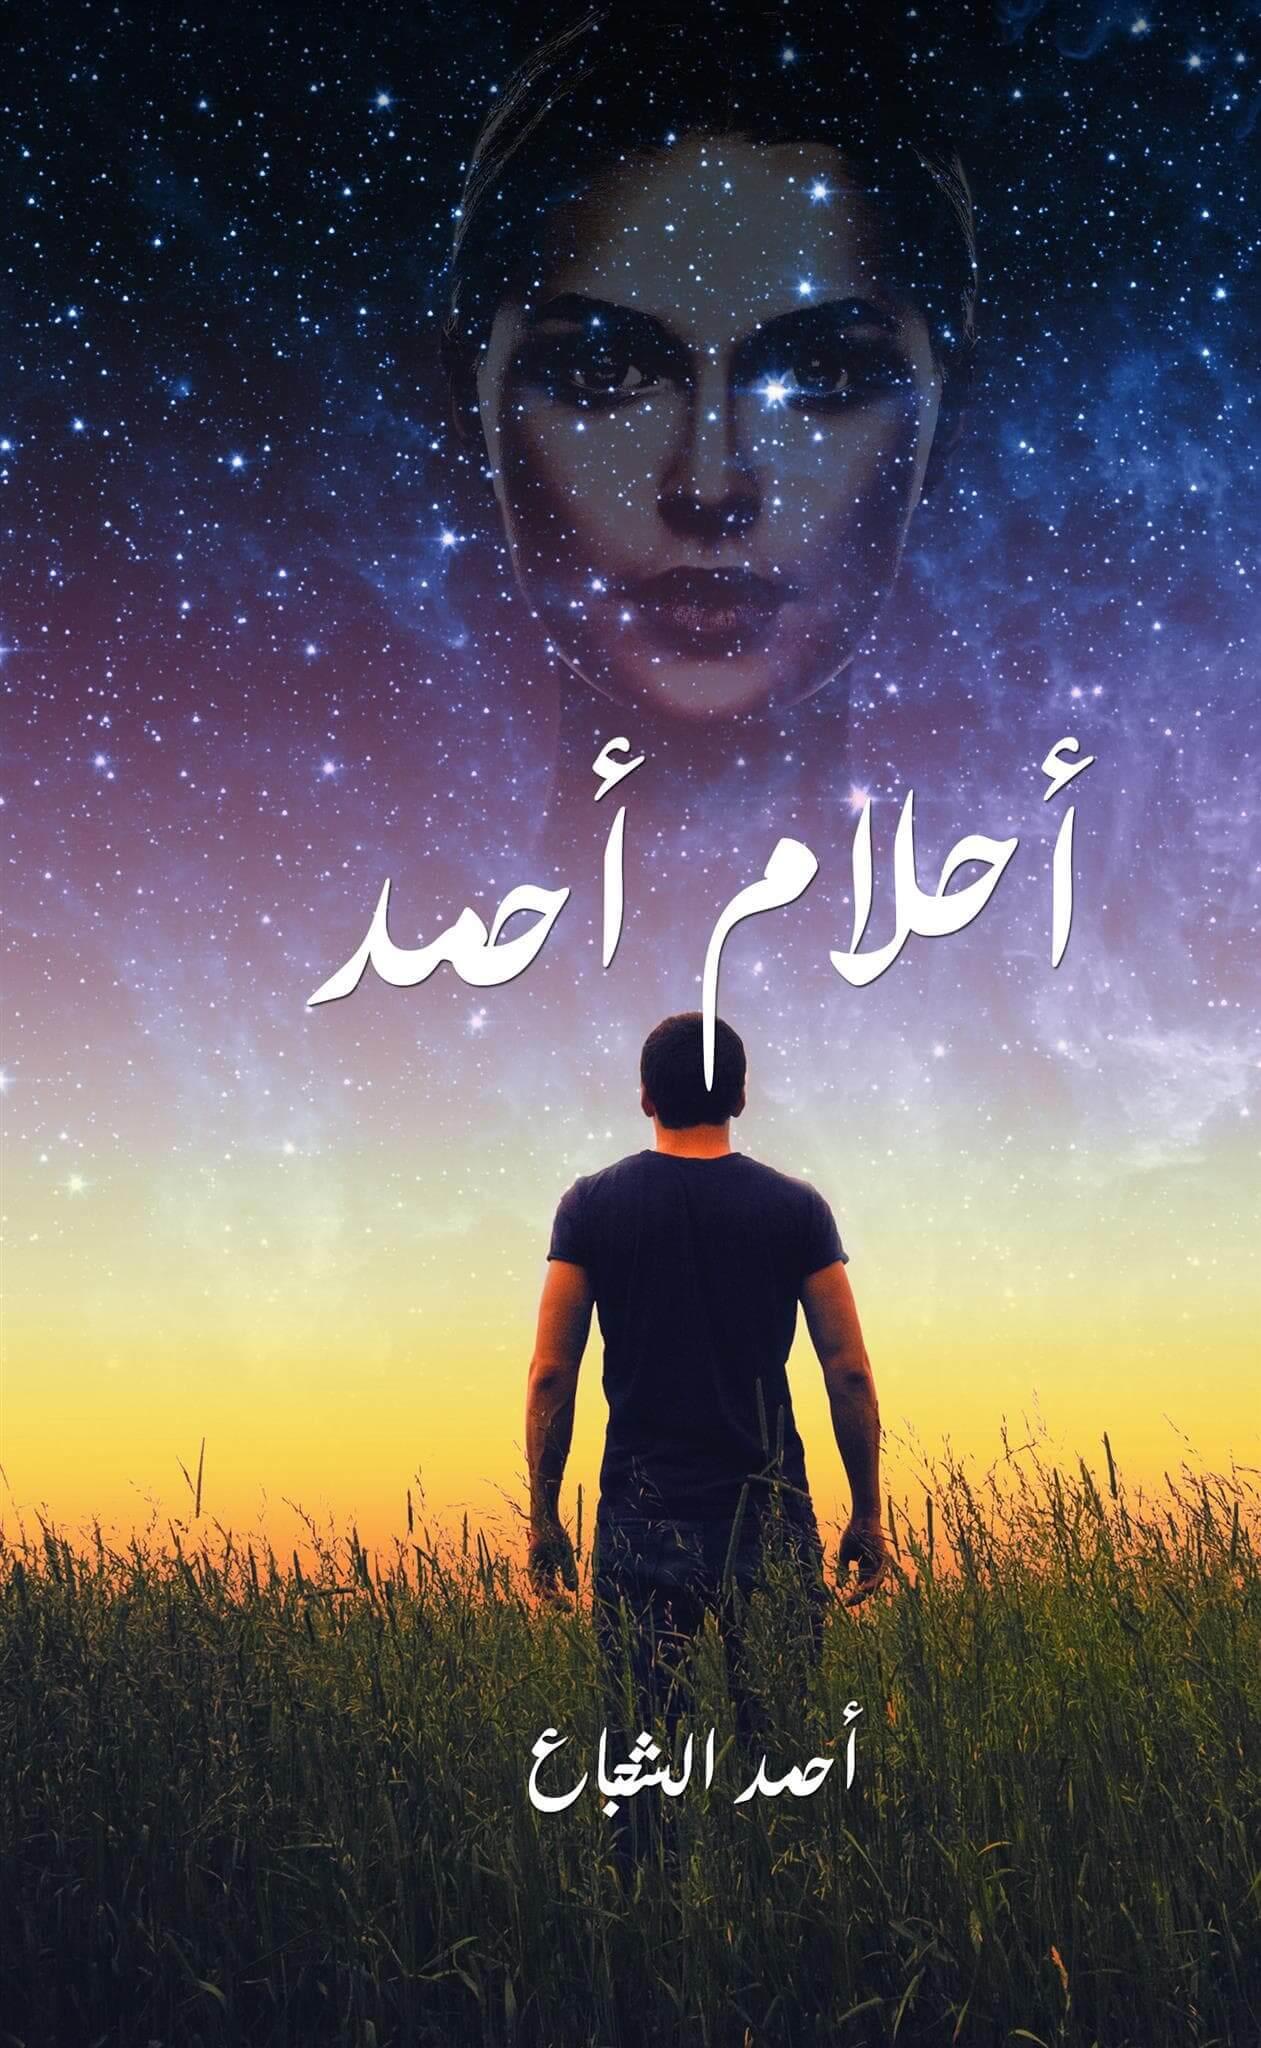 Ahmed's Dreams